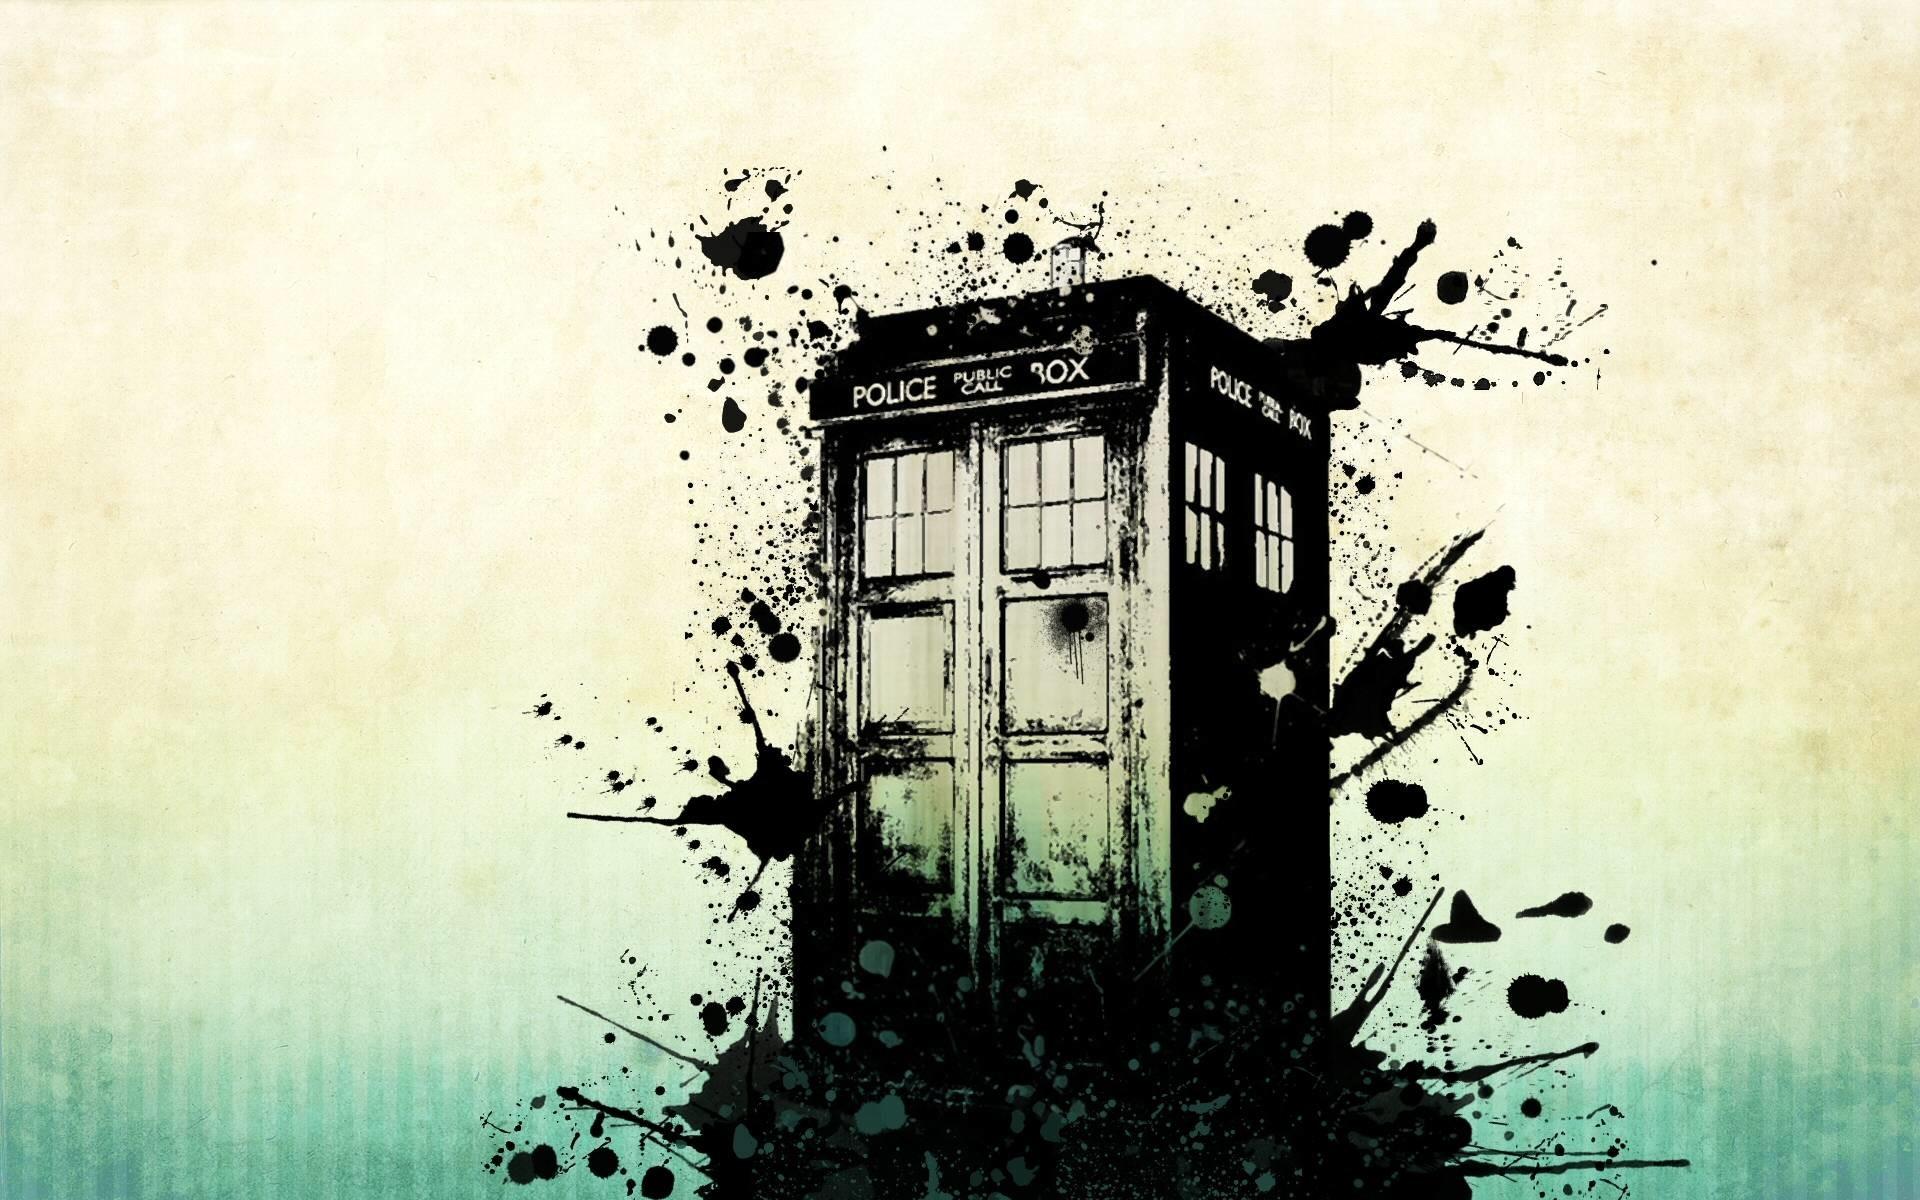 TARDIS Doctor Who wallpaper | | 65966 | WallpaperUP